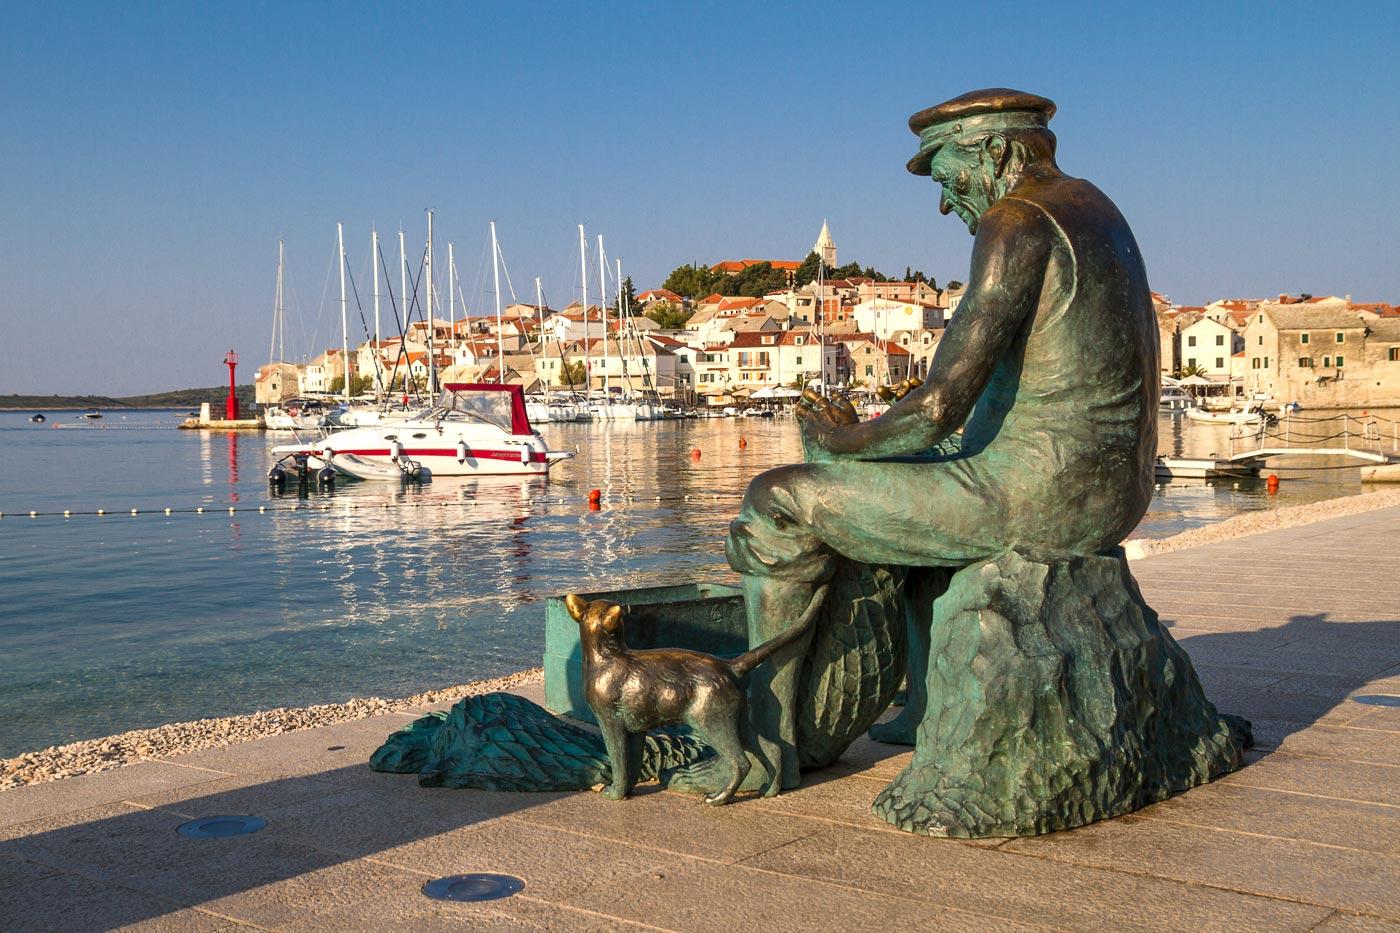 Скульптура рыбака на набережной. Примоштен, Хорватия